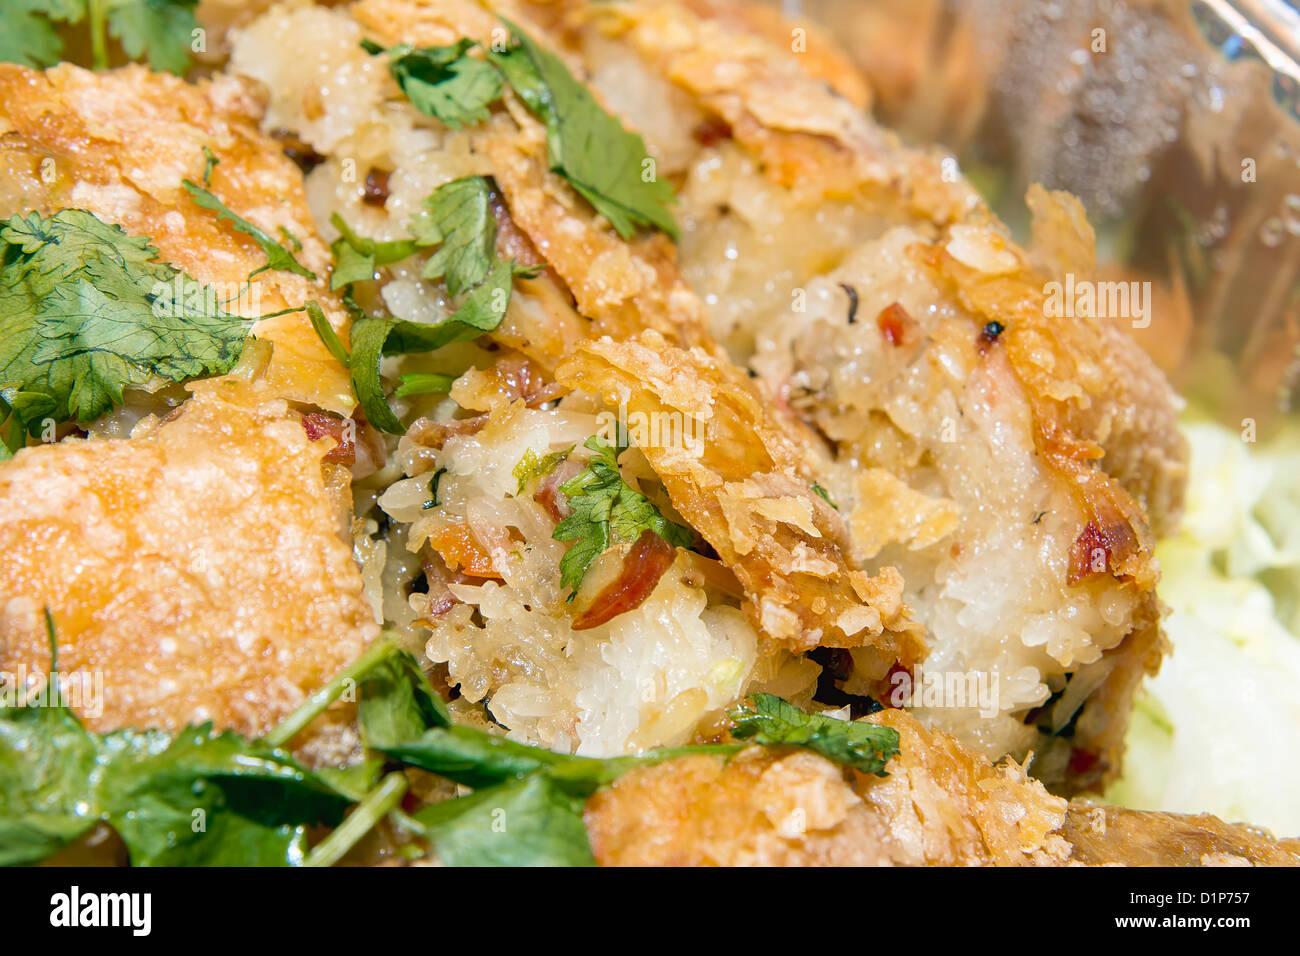 Chinese Deep Fried Chicken Stuffed with Glutinous Rice Sausage Dried Shrimp Black Mushroom and Cilantro Macro - Stock Image